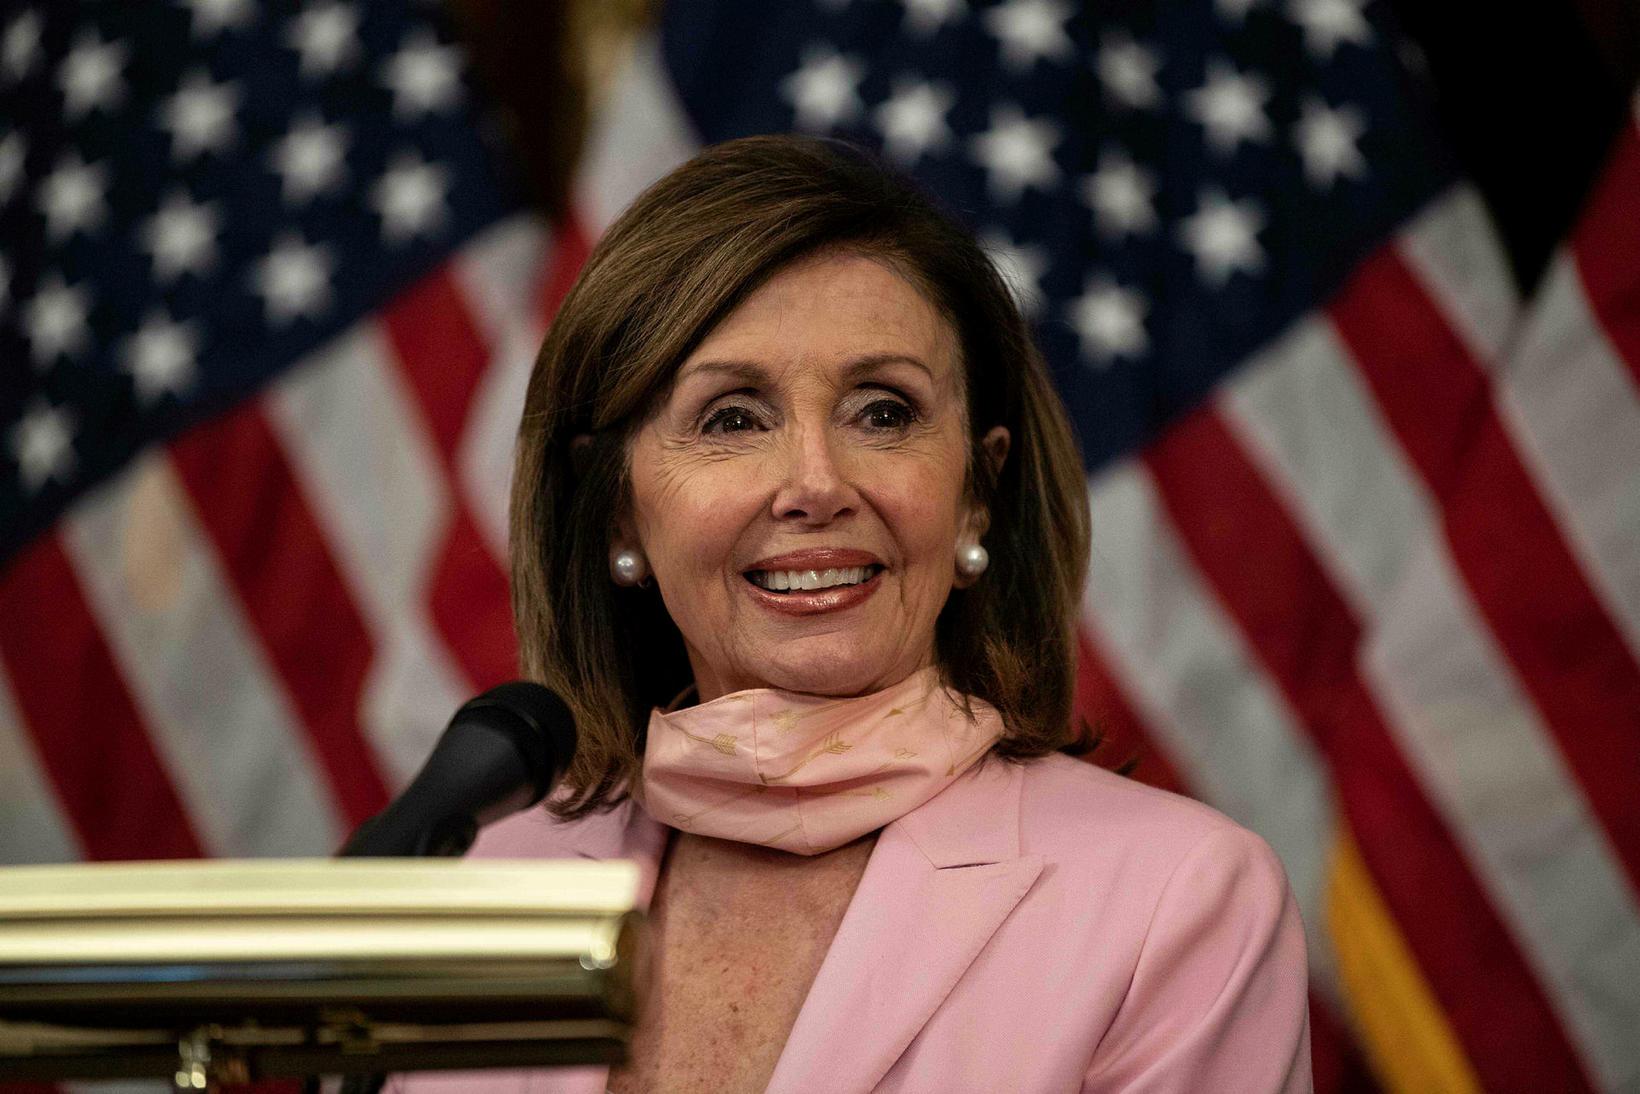 Nancy Pelosi, forseti fulltrúadeildar Bandaríkjaþings.